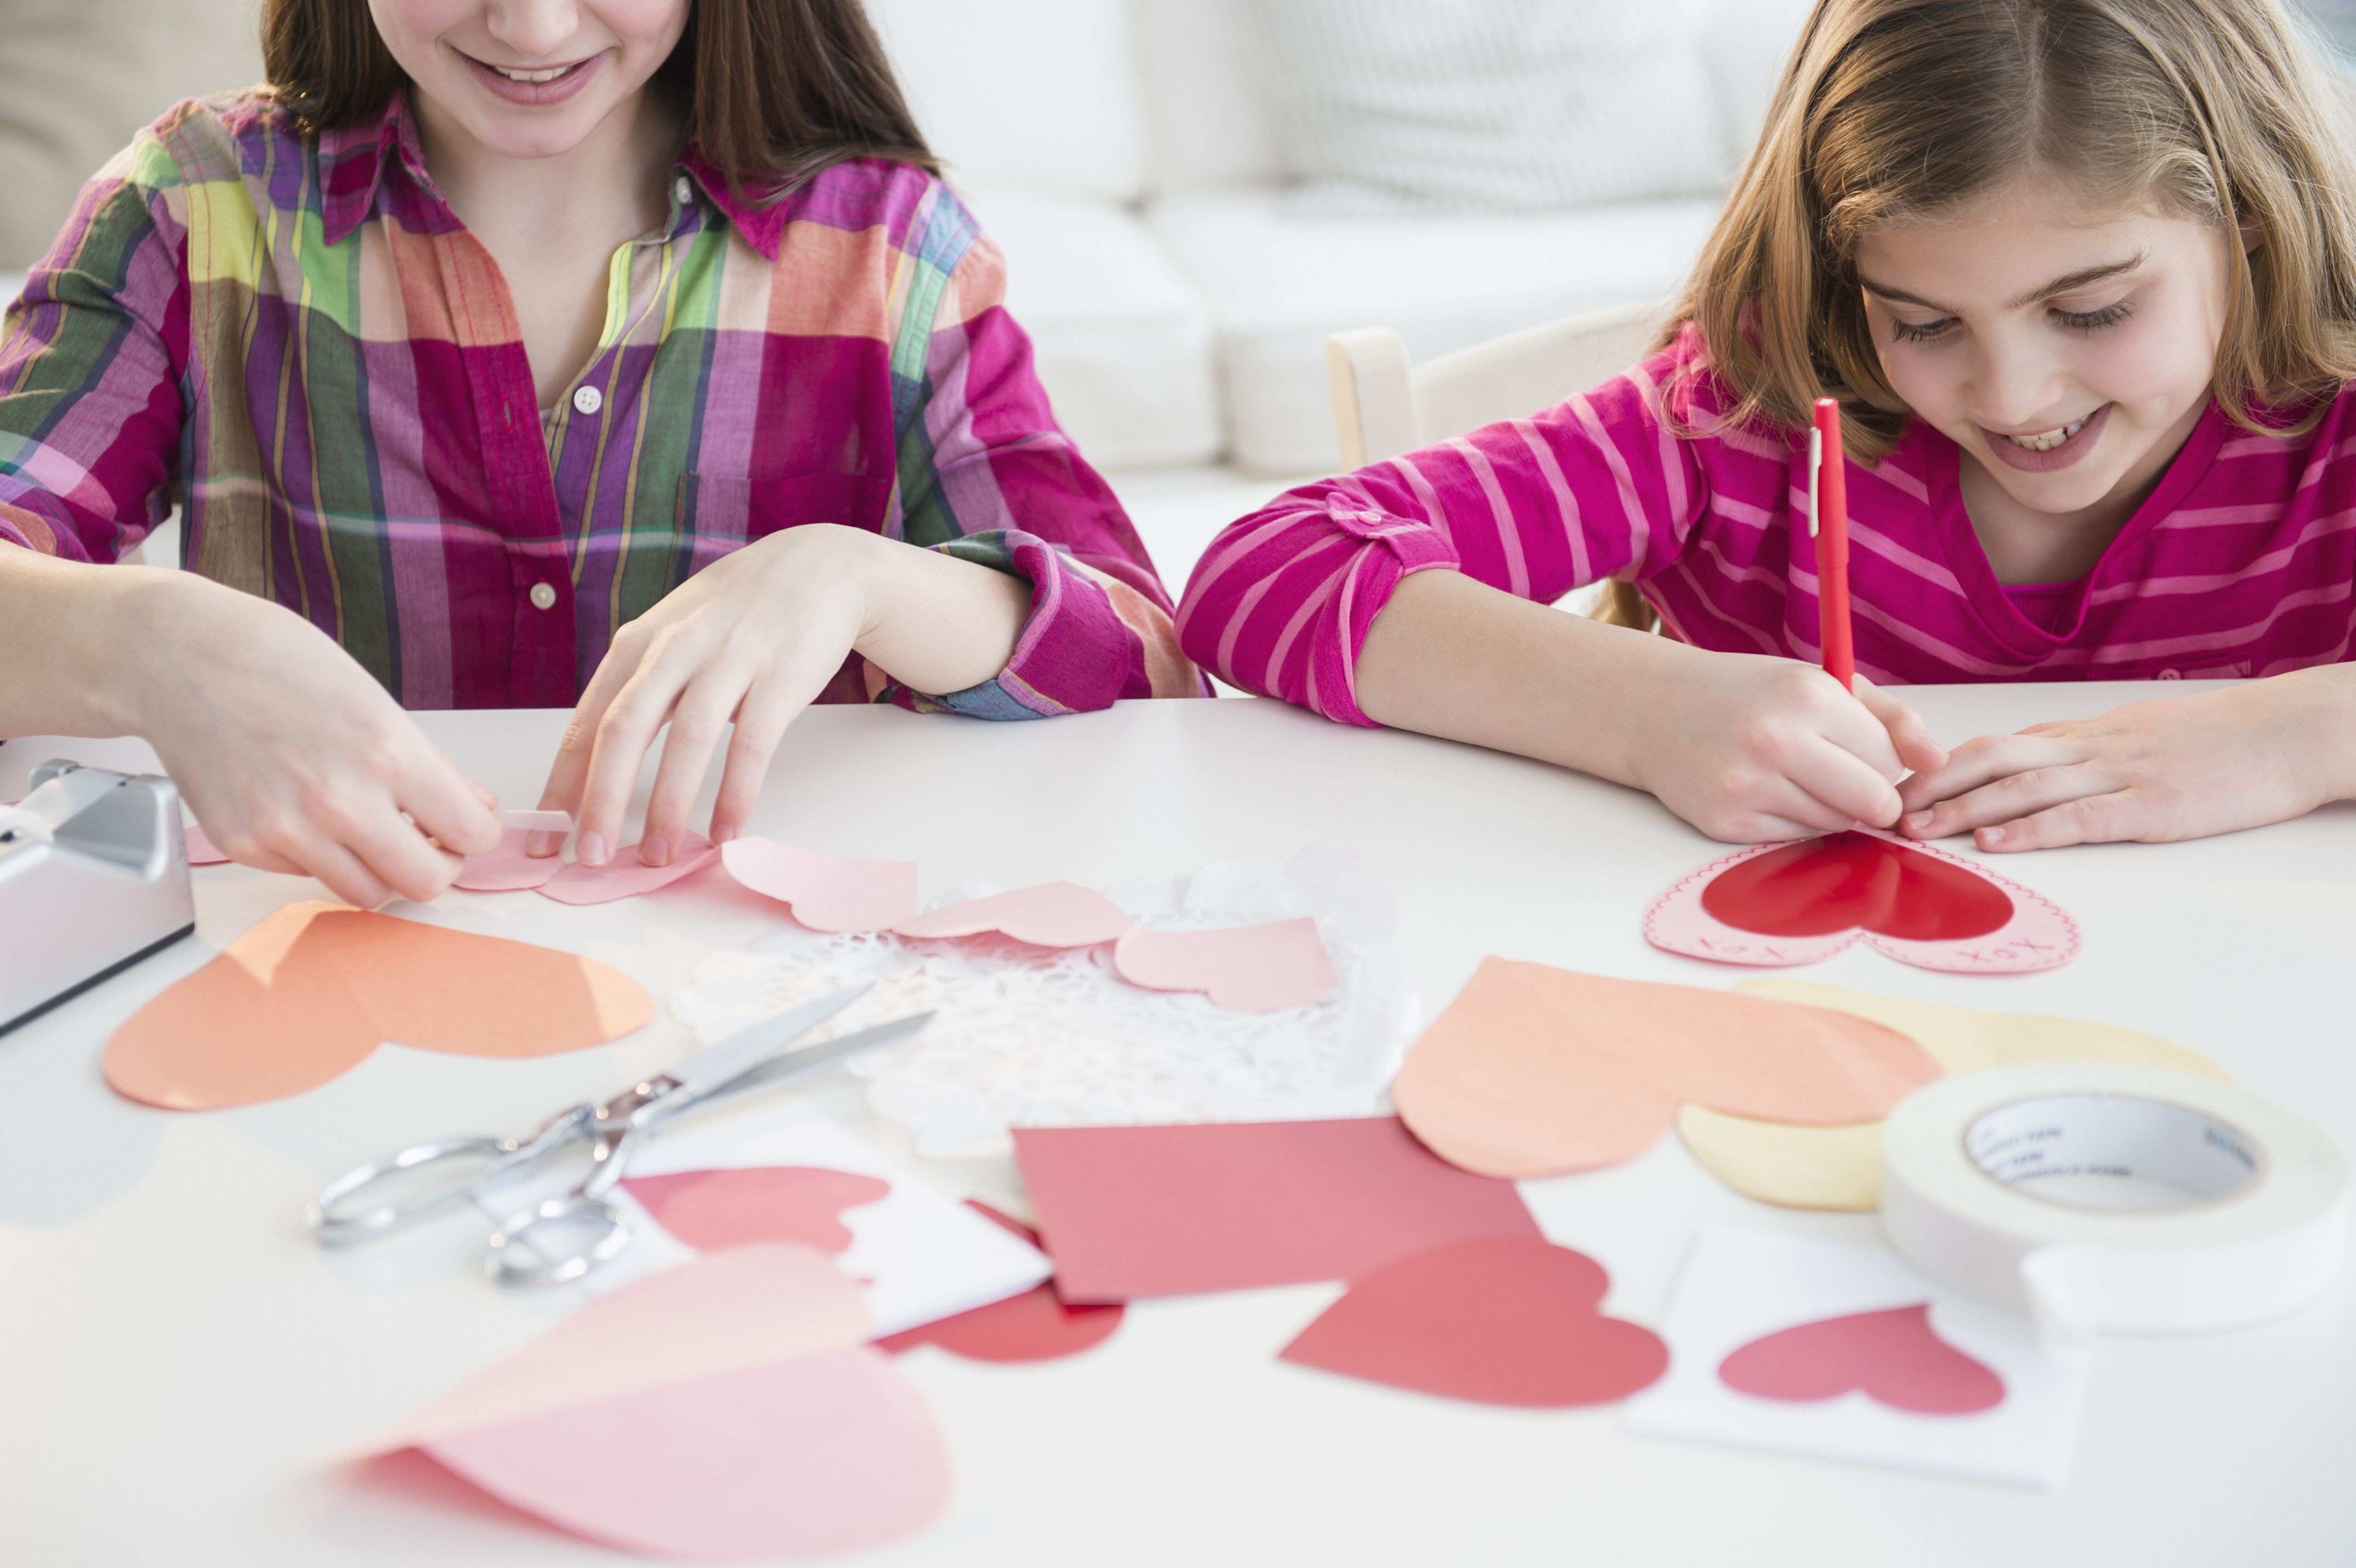 Vintage Valentines Day Decor 543 Free Printable Valentine S Day - Free Printable Valentine's Day Decorations